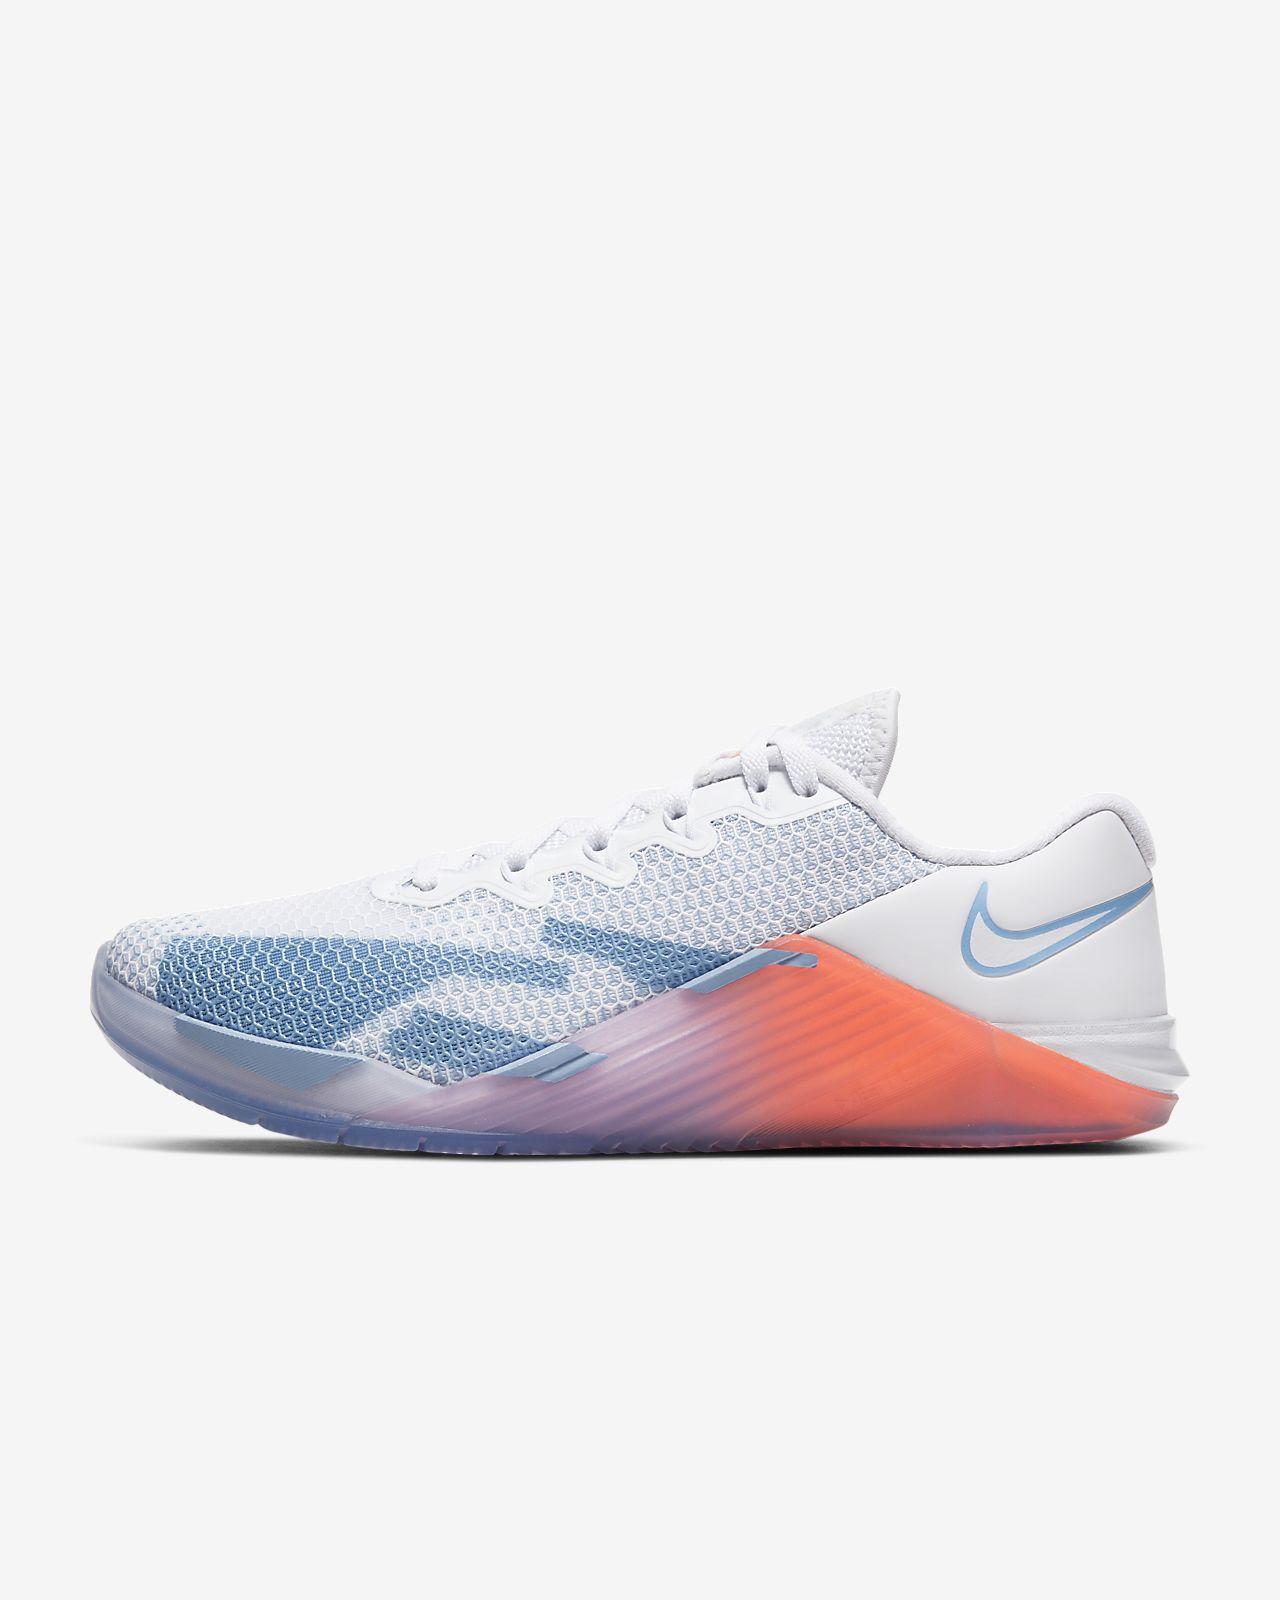 Chaussure de training Nike Metcon 5 Premium pour Femme